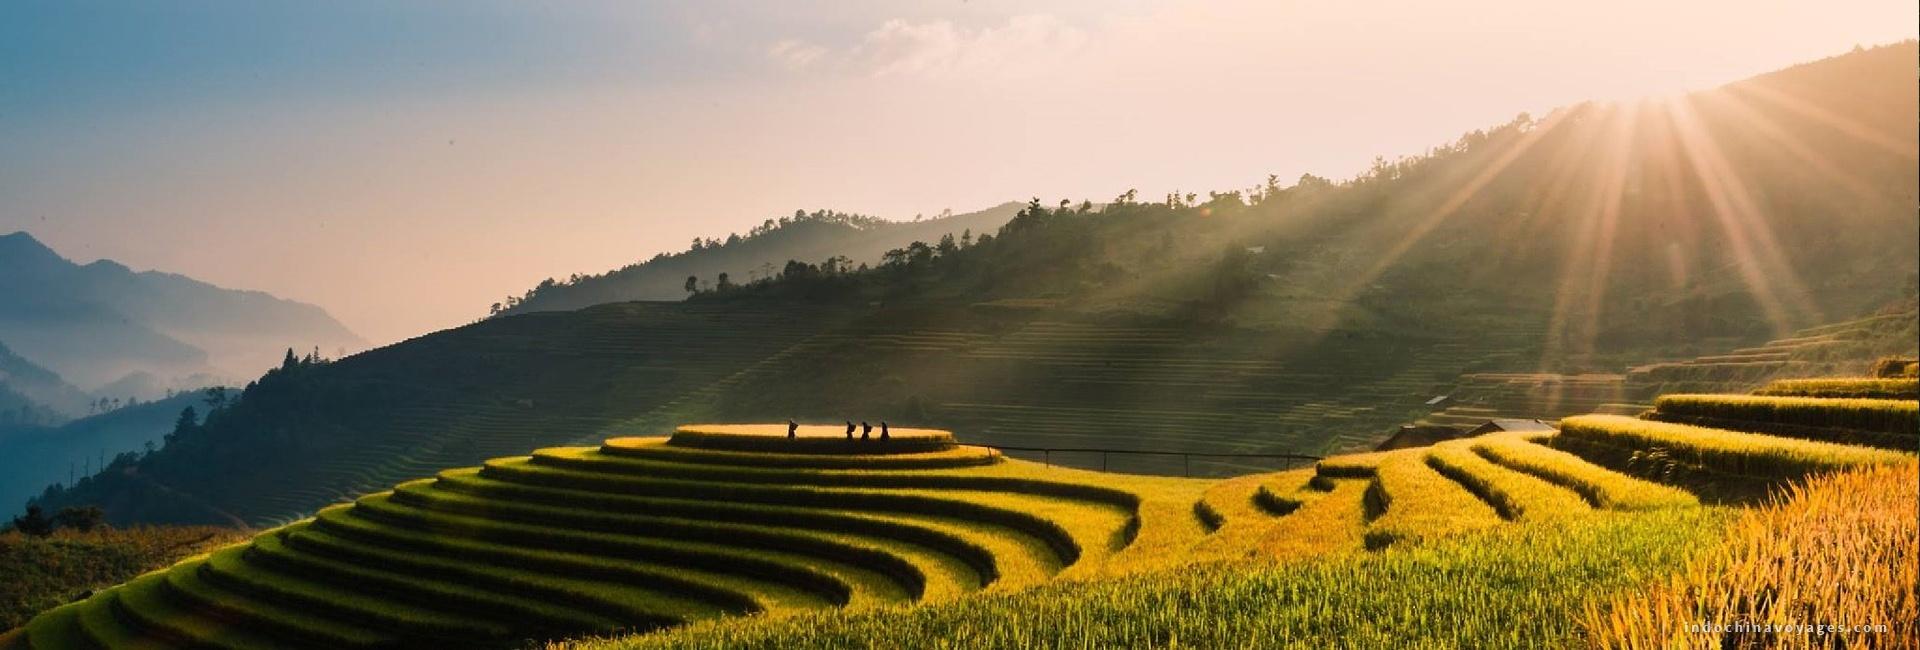 Northern Vietnam & Laos Discover 12 days